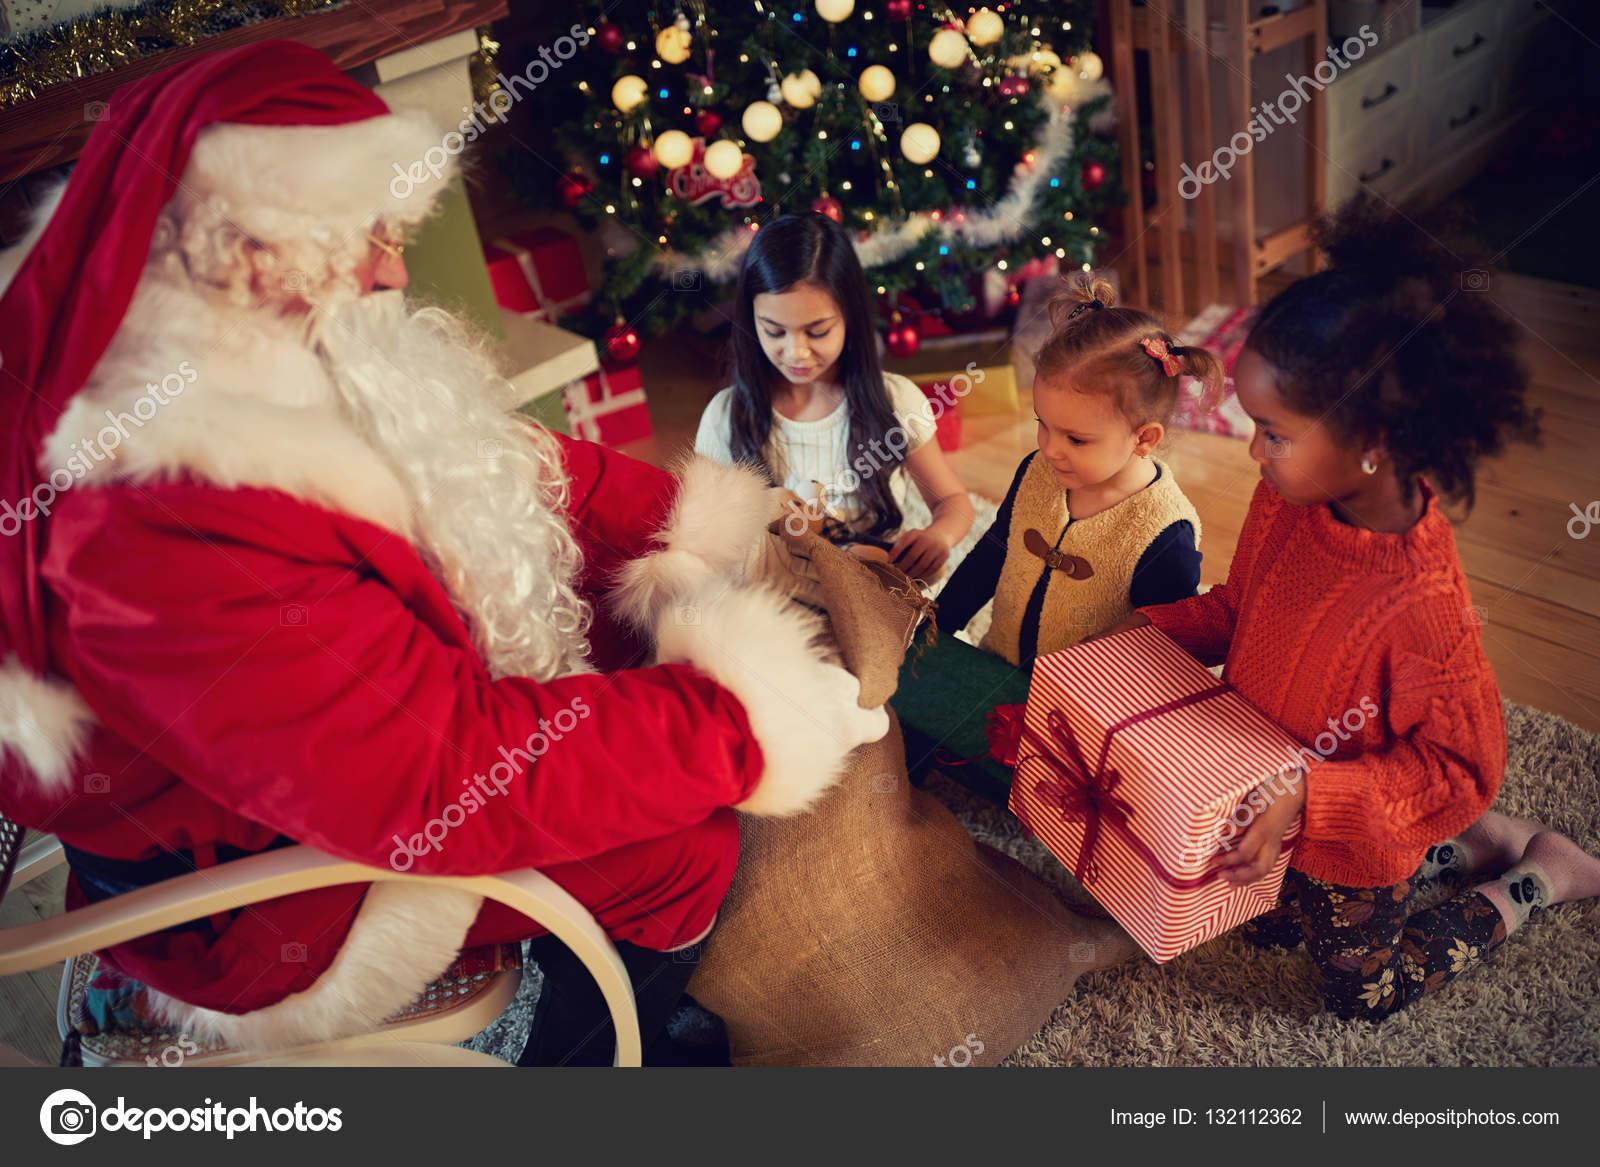 real santa claus gives presents to kids stock photo - Santa Claus Presents